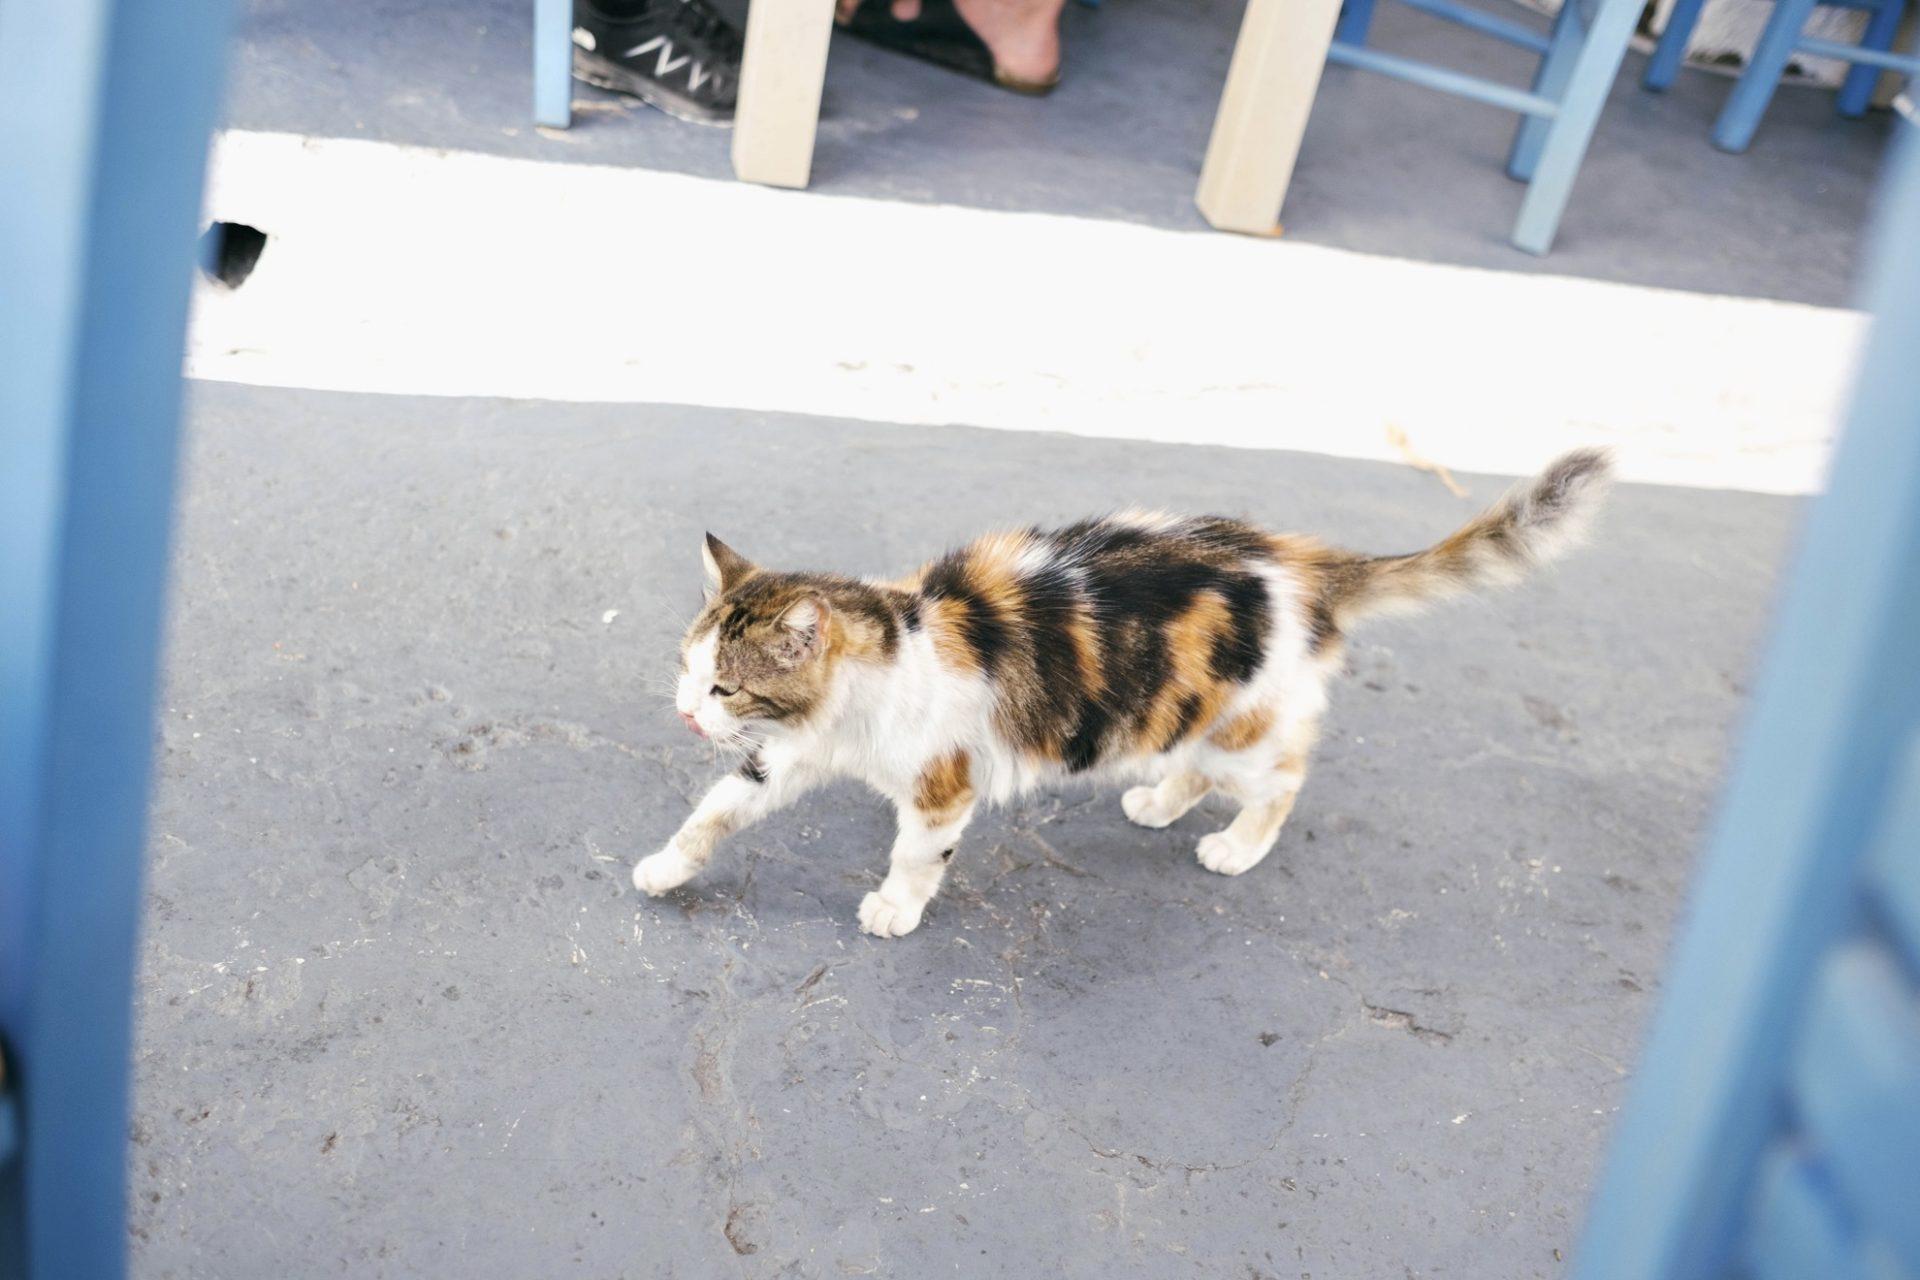 chats grecs@laurentparienti - 15